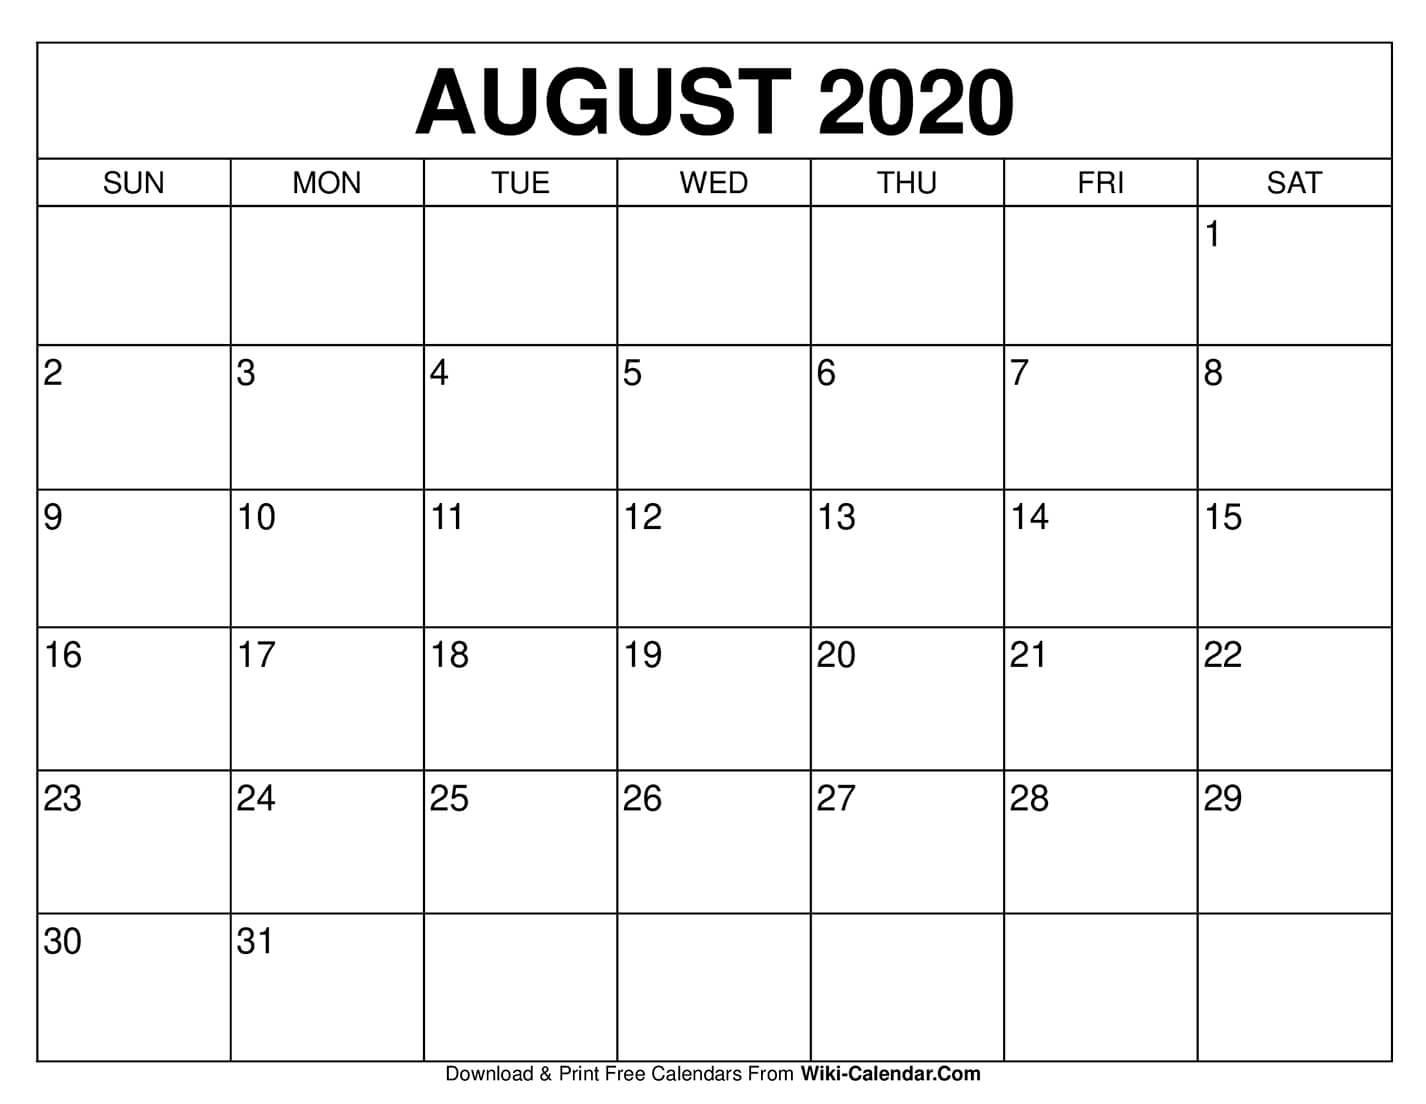 Take Print Free Calendars Without Downloading